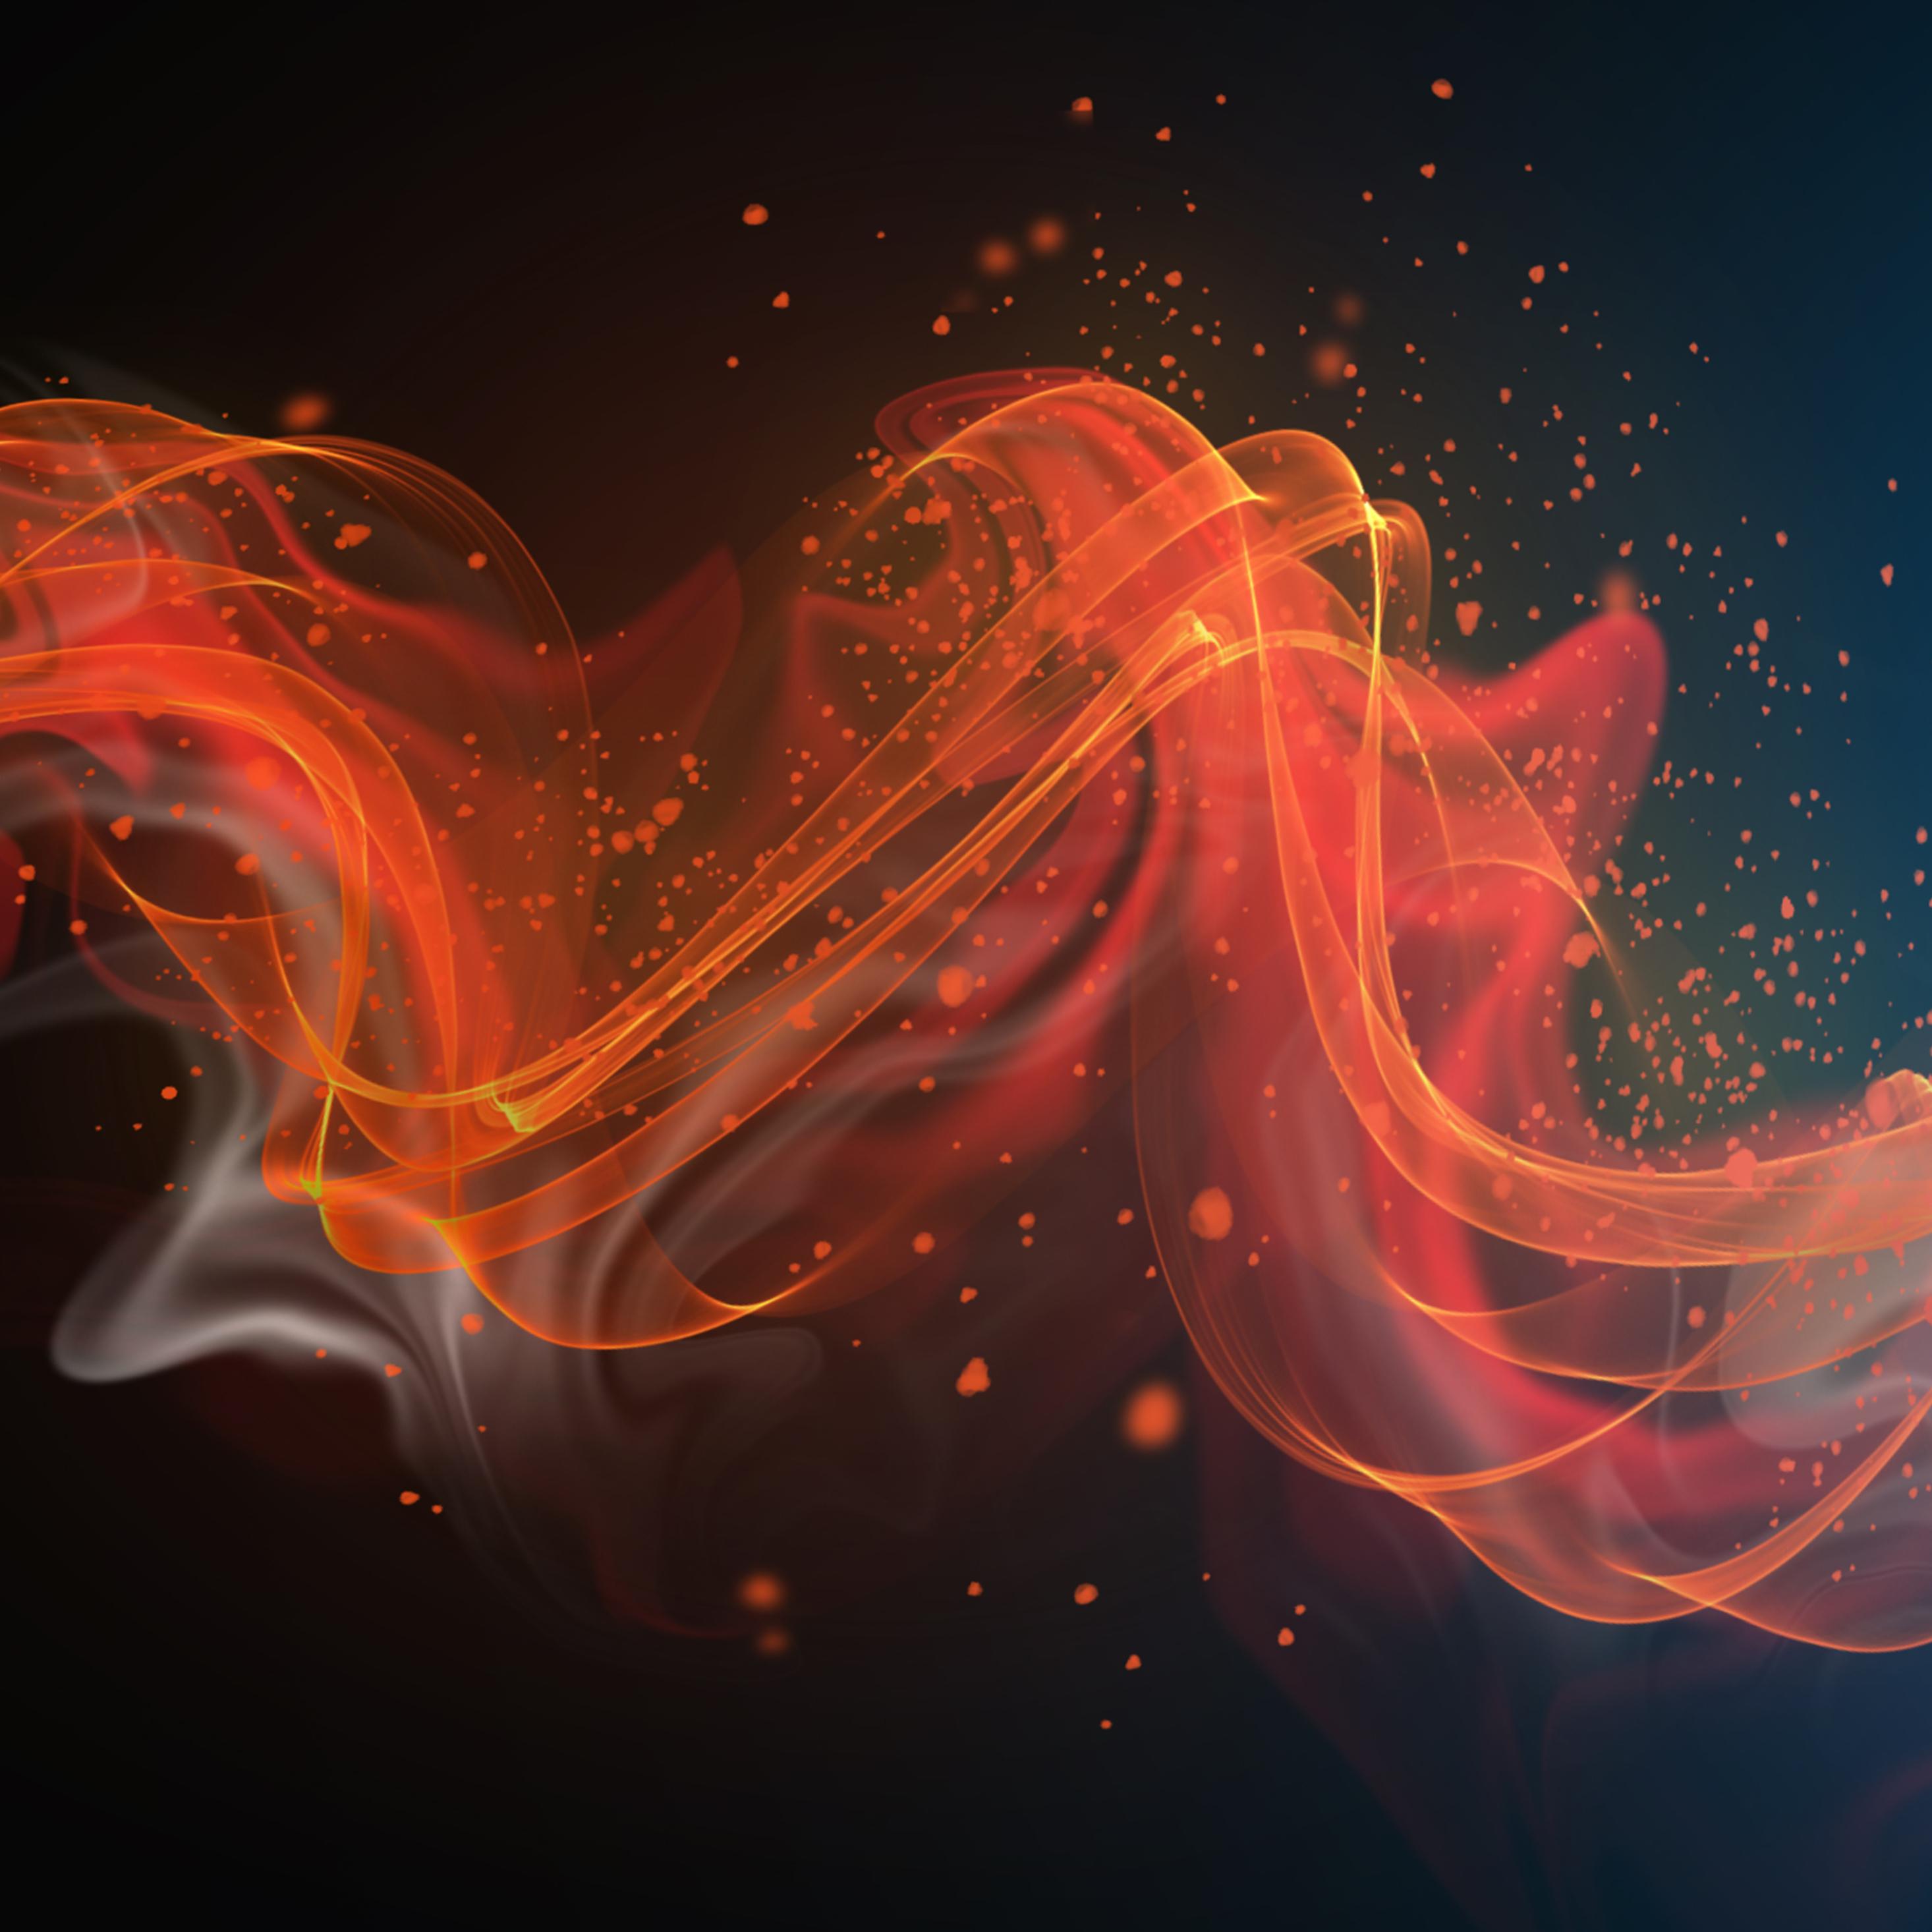 2932x2932 Color Wave Abstract 4k Ipad Pro Retina Display